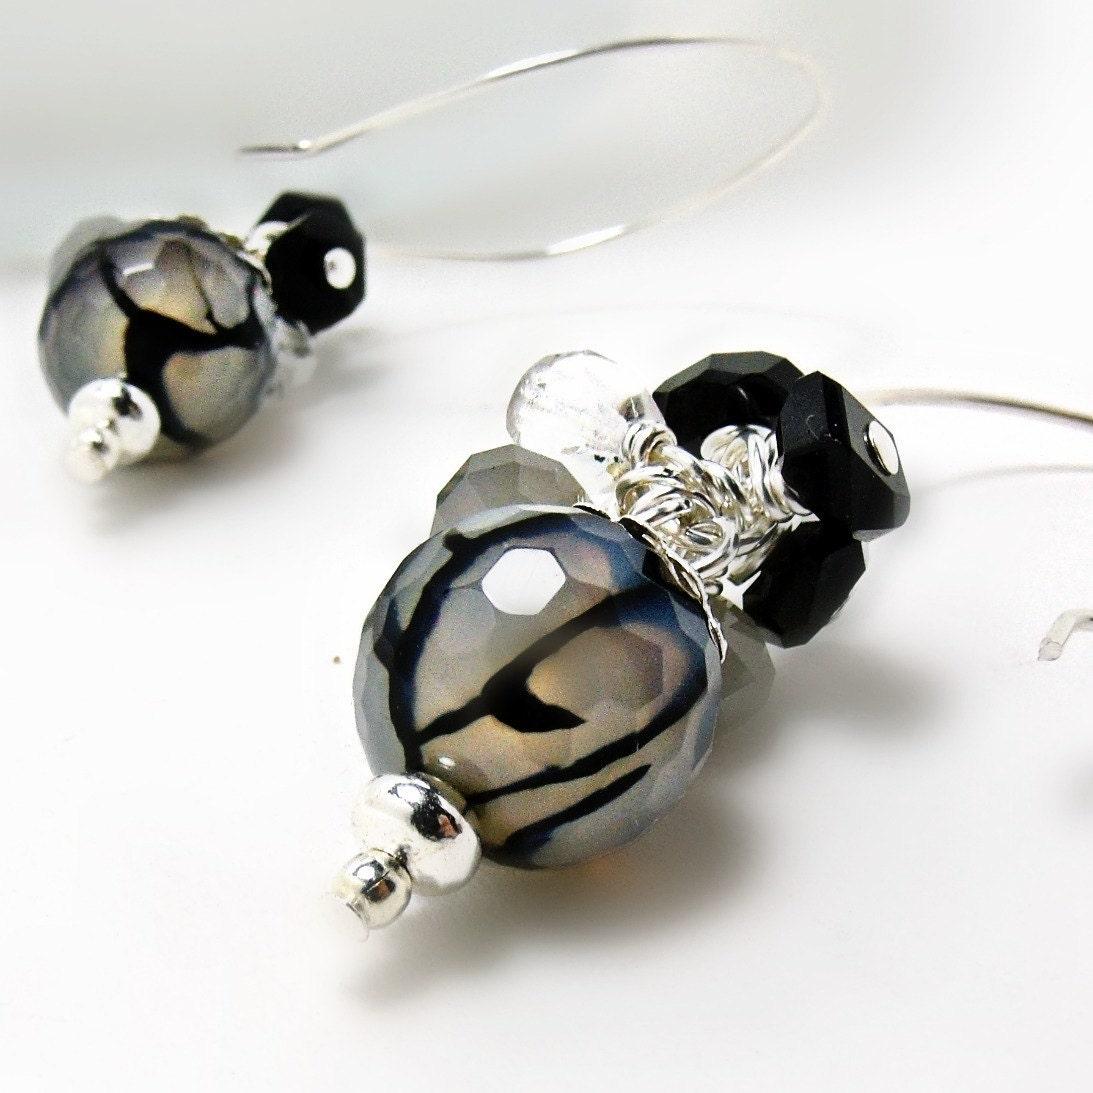 cracked agate earrings w black spinel dragonskin agate